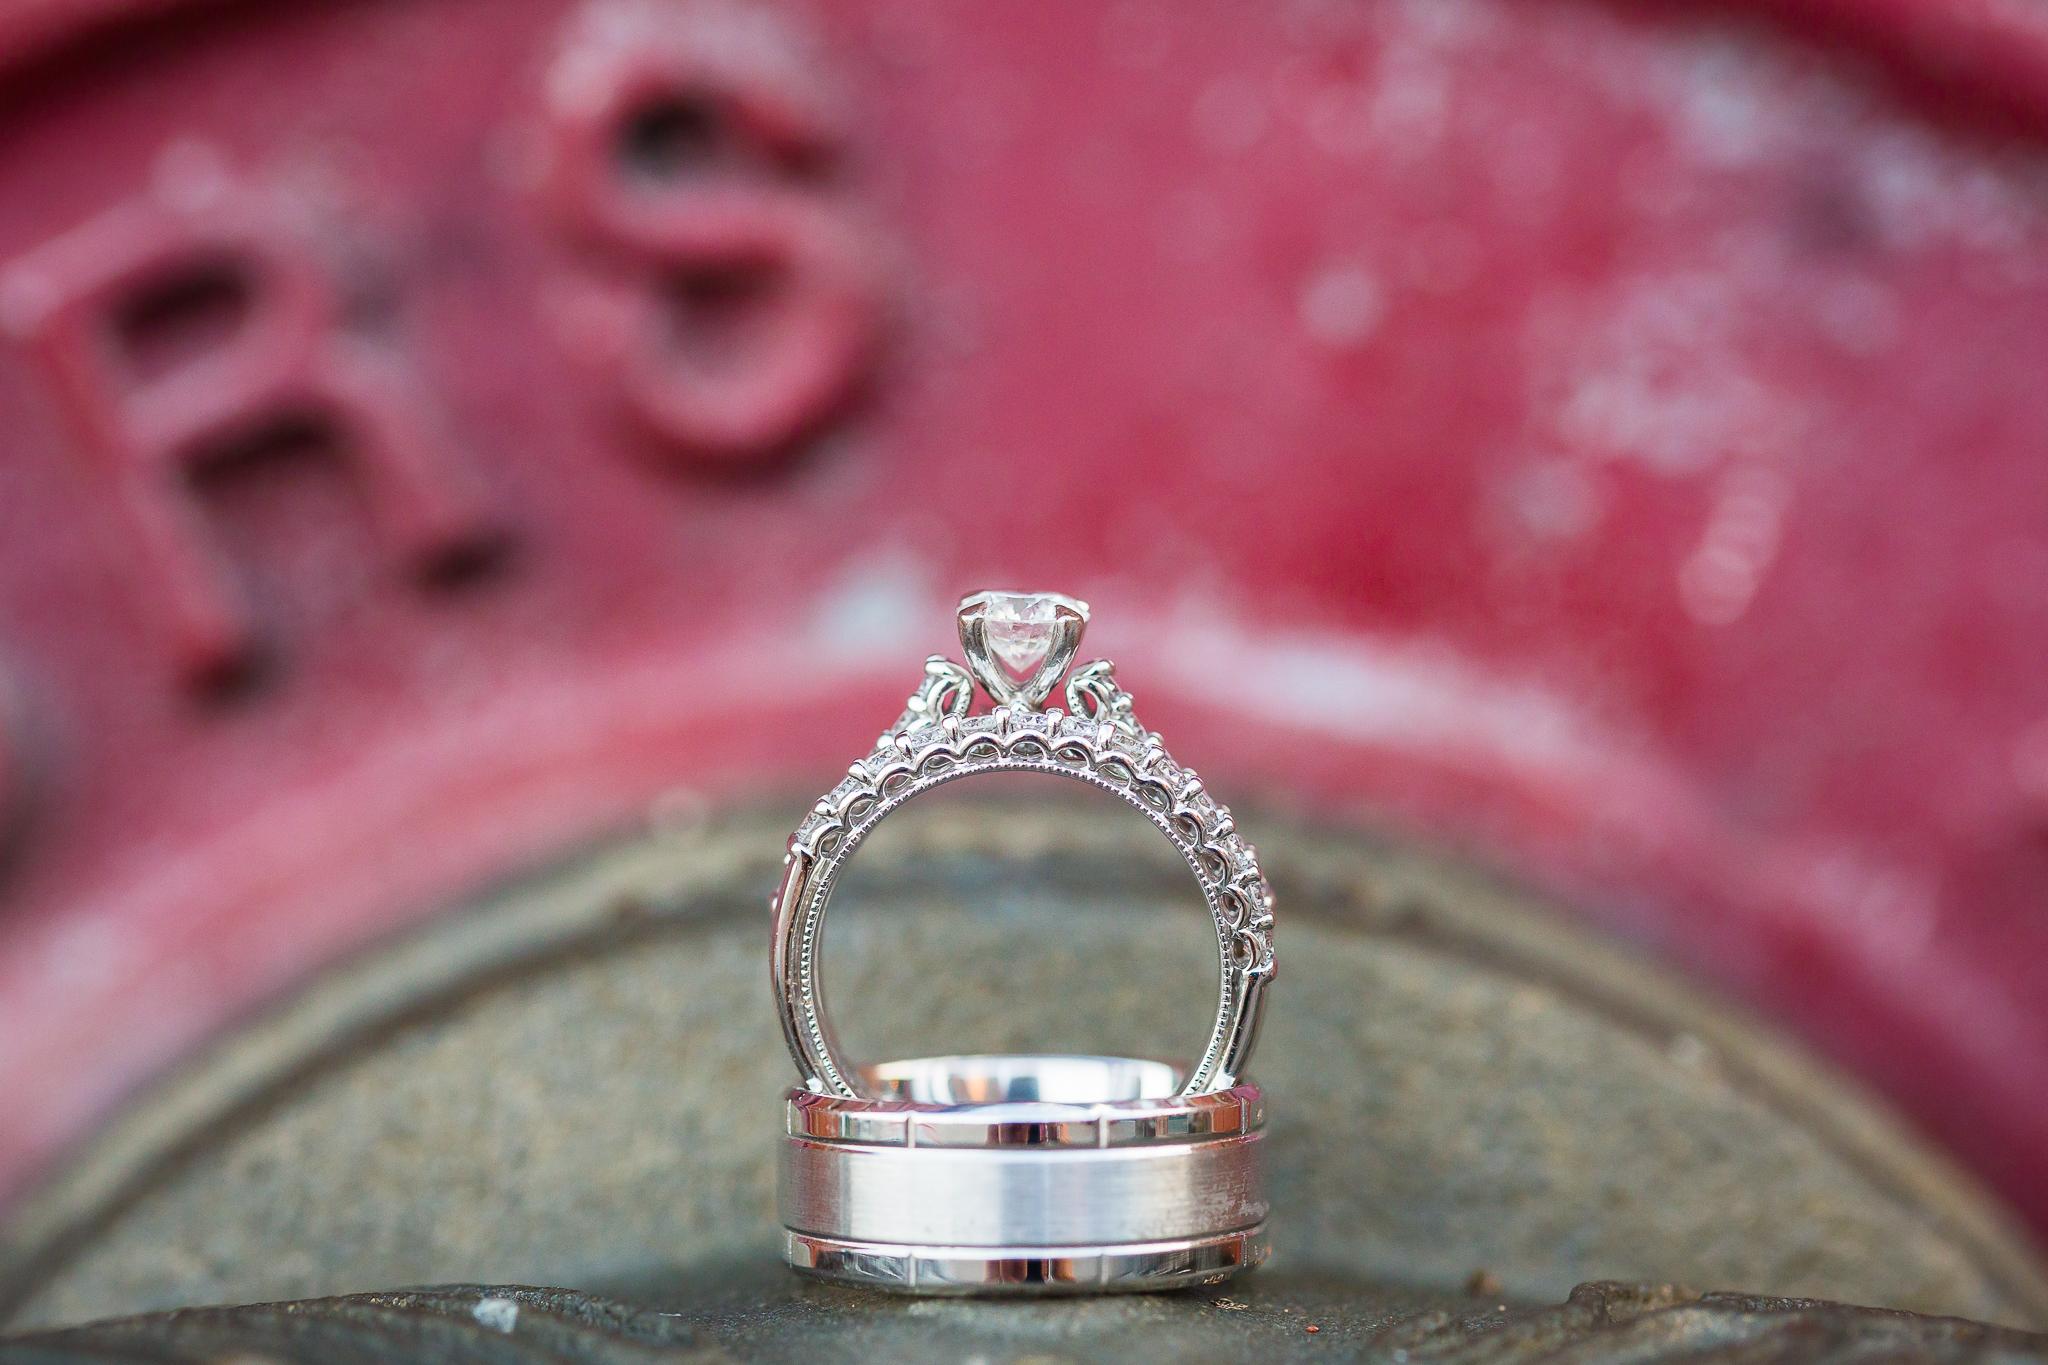 mariage-bague-detail-espace-shawinigan-mauricie